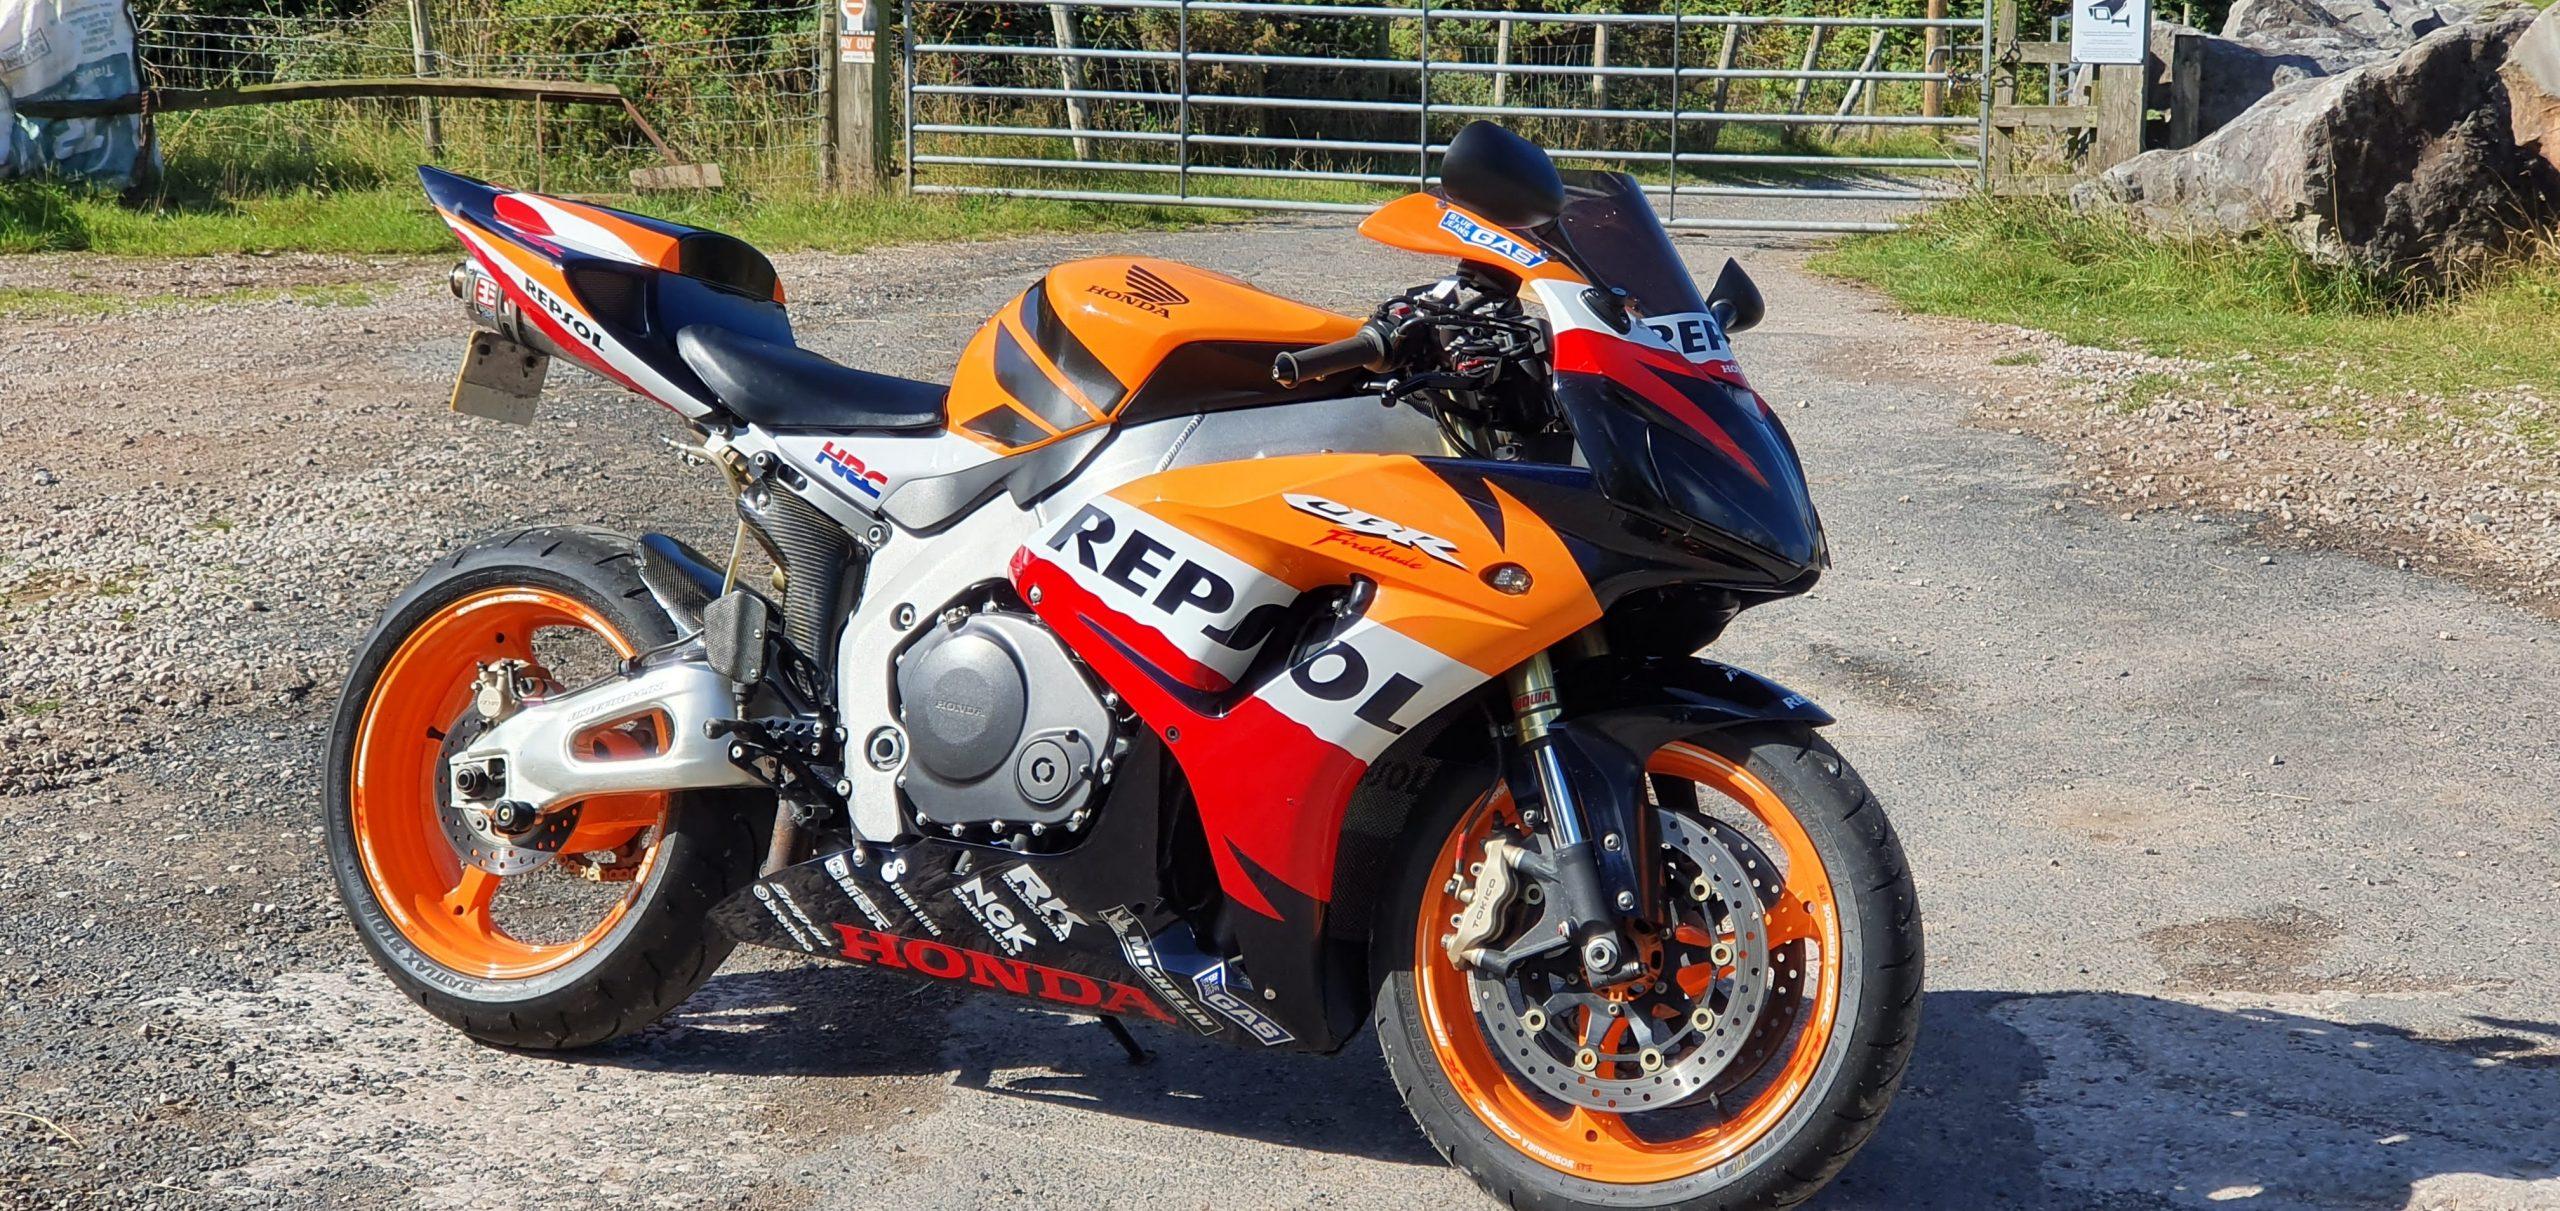 Used Bike Review: Honda Fireblade 1000RR (06-07)